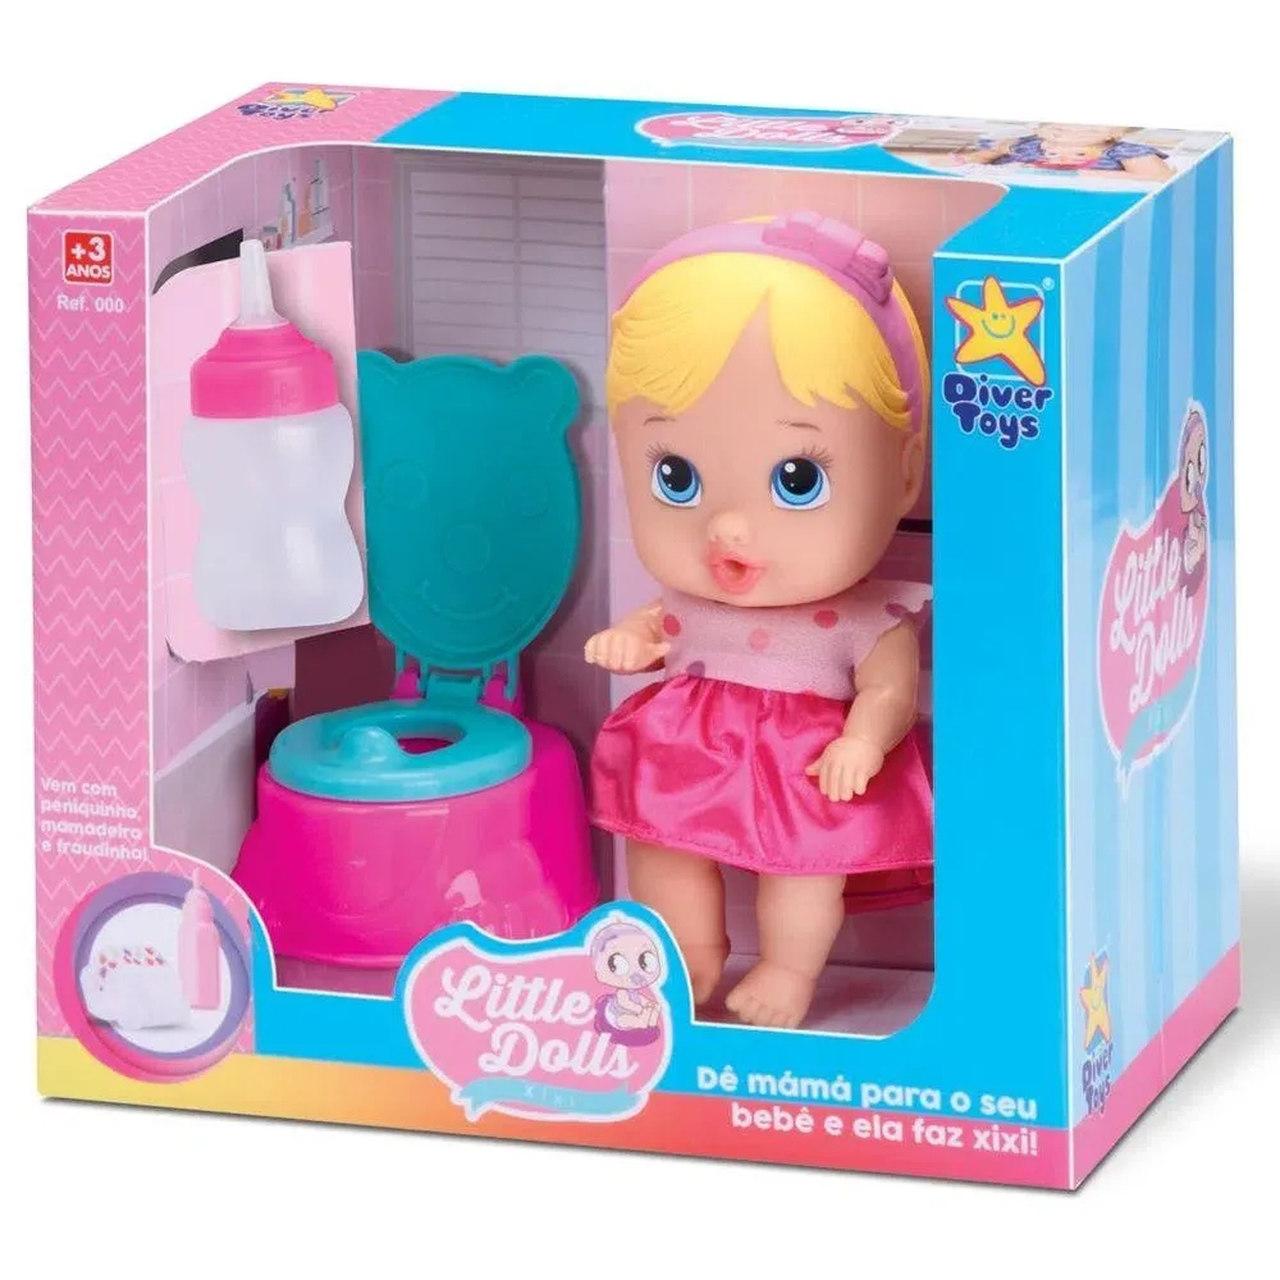 Boneca Little Dolls Faz Xixi Divertoys - Ref.: 8002